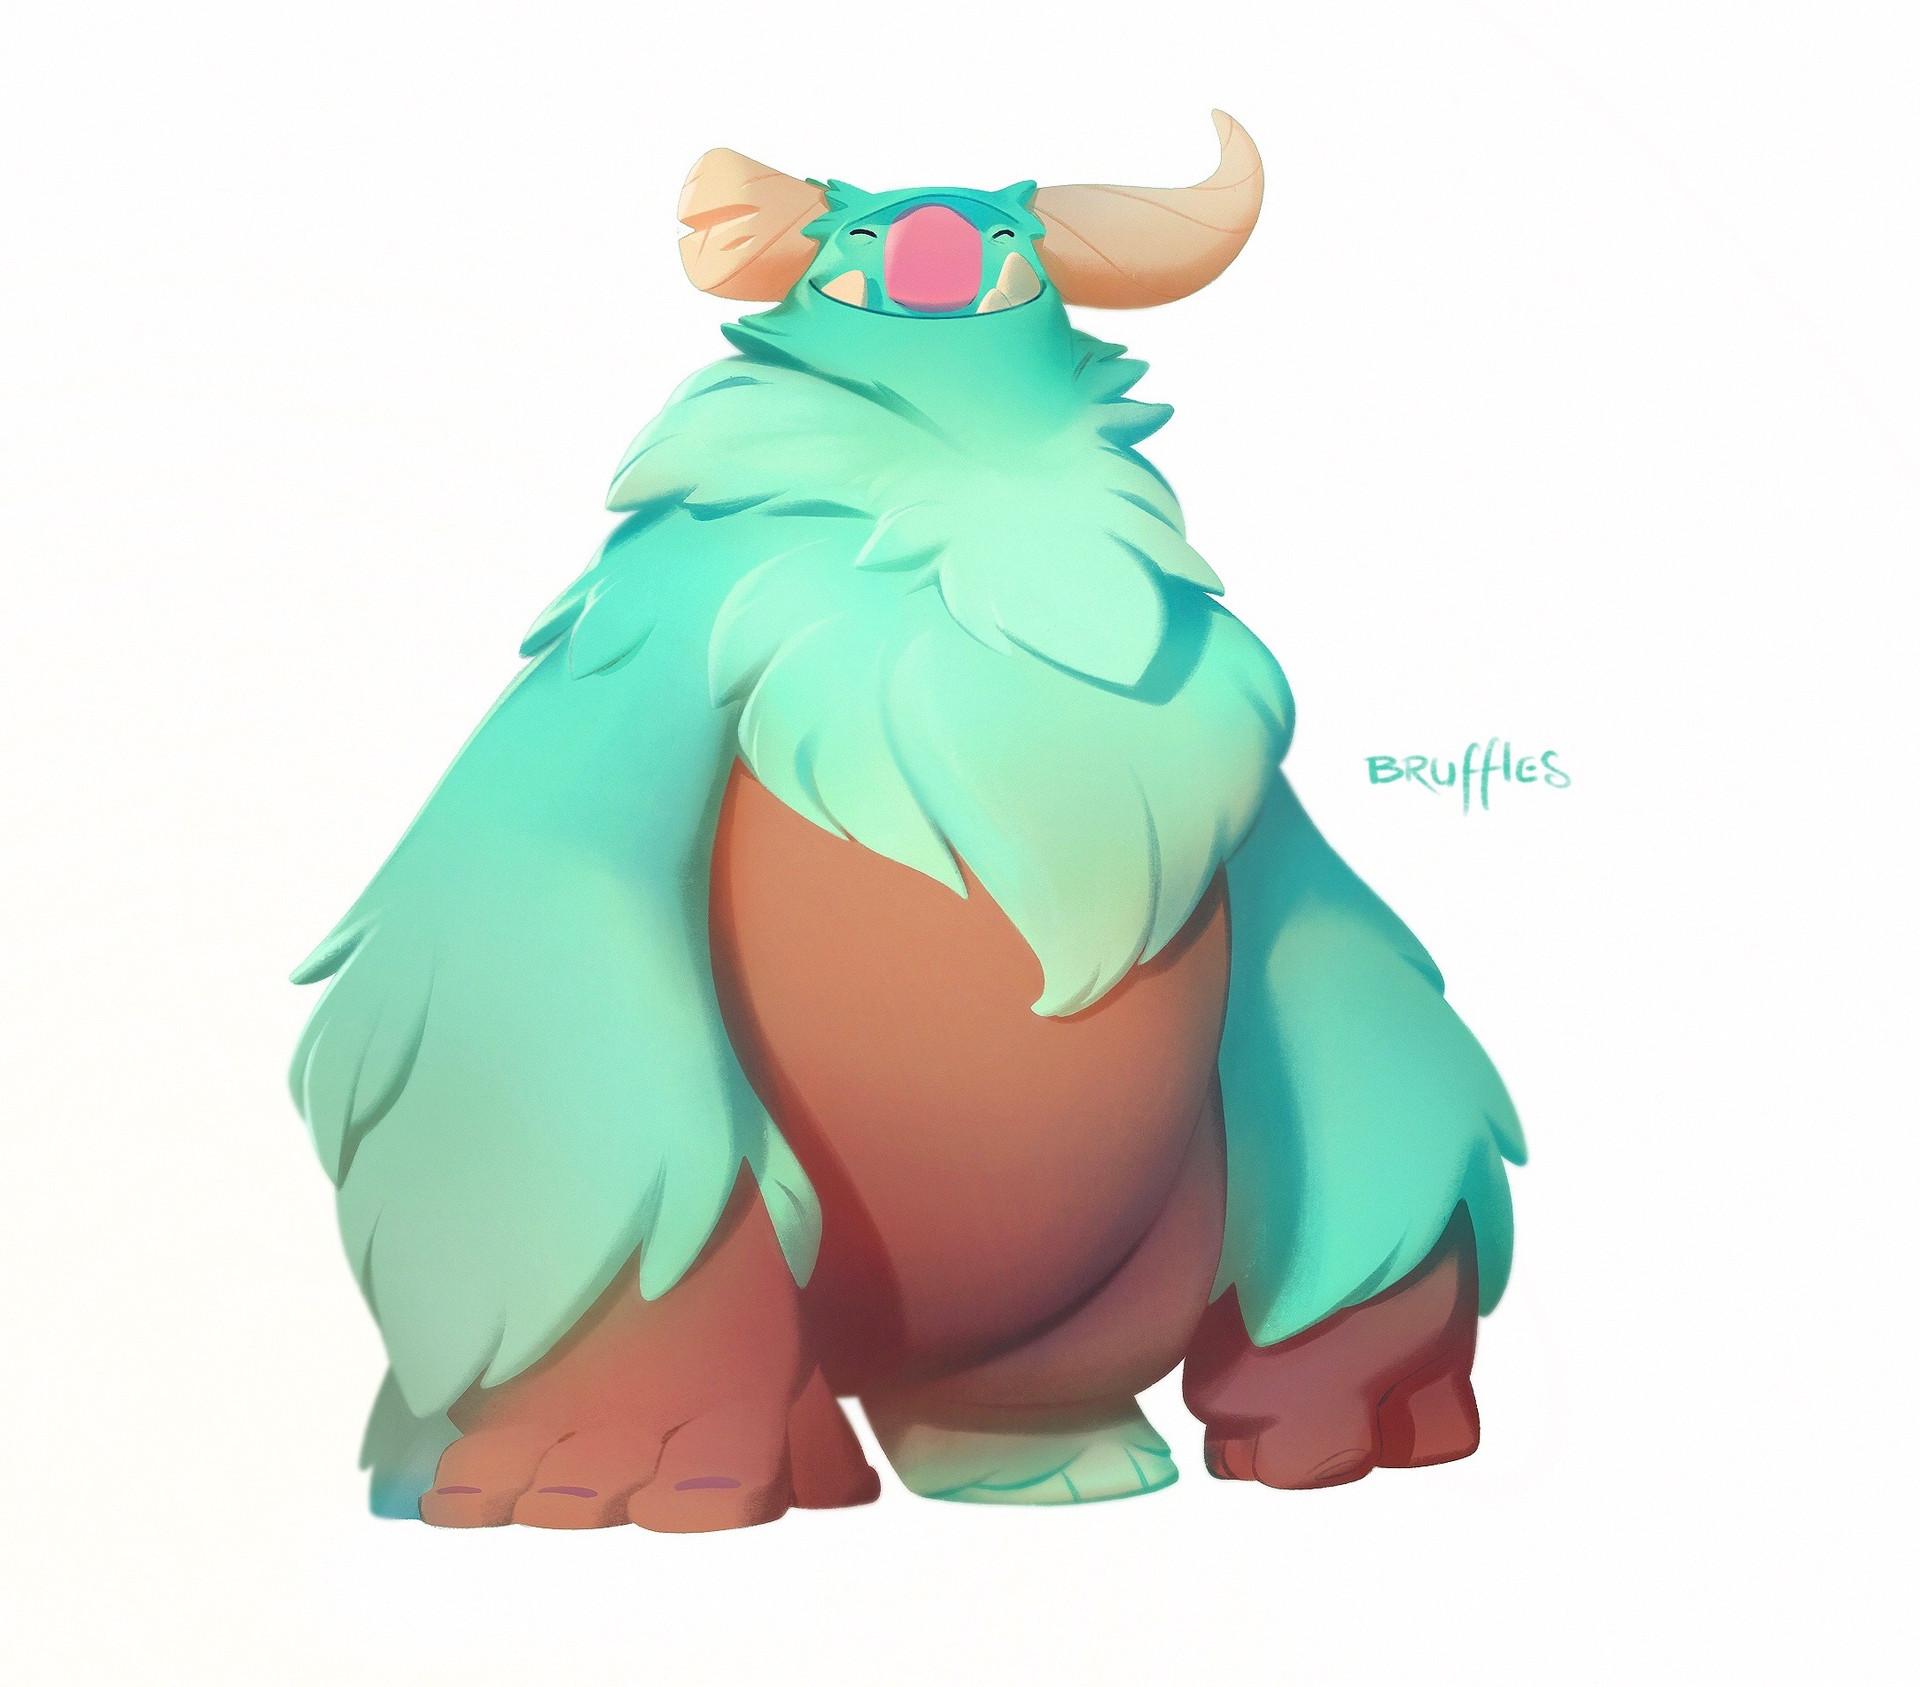 Nicholas kole bruffles